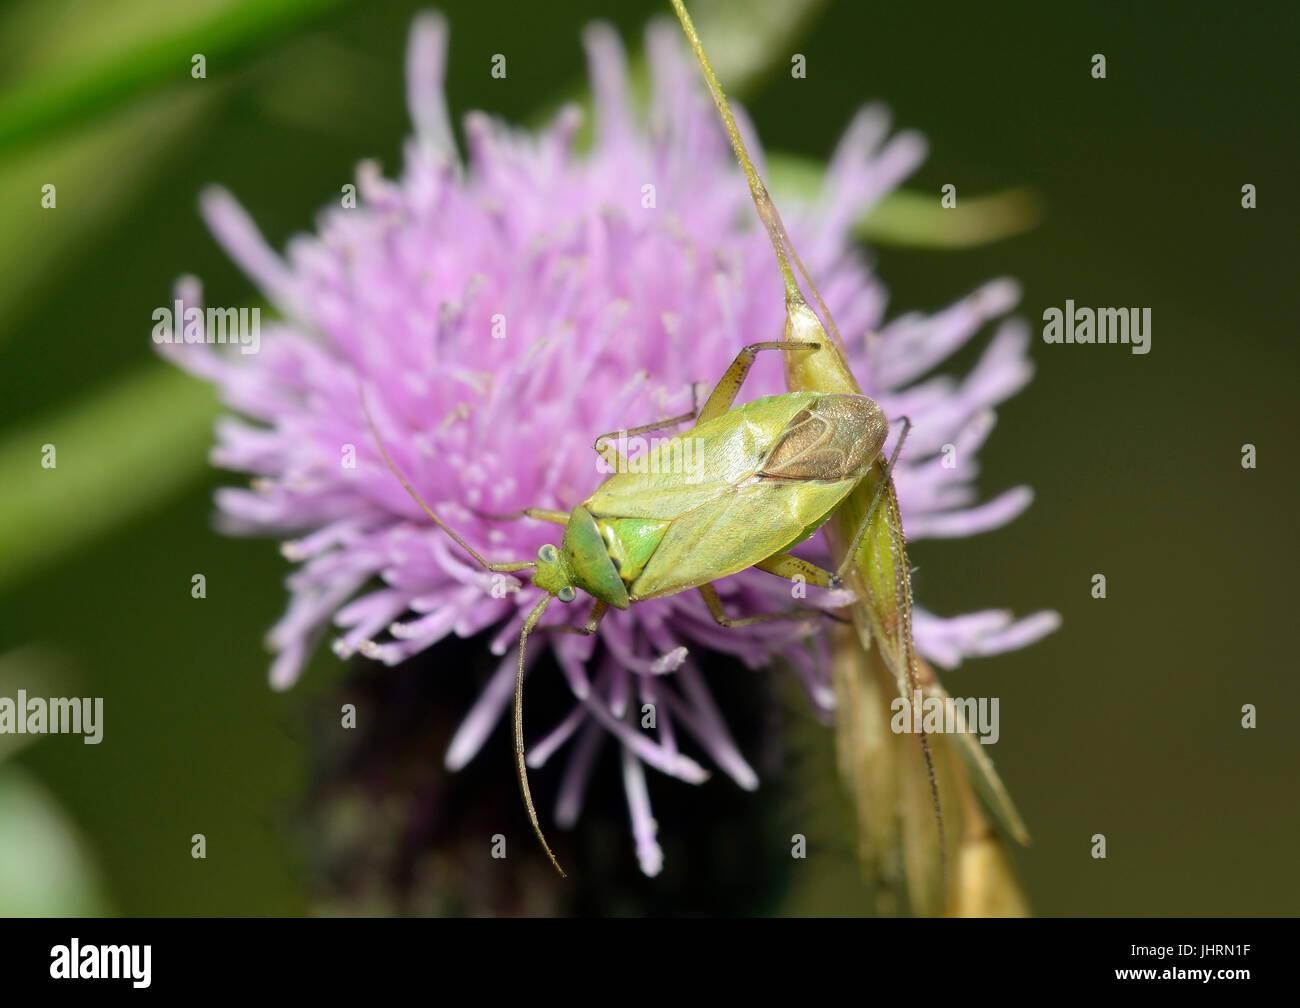 Potato Capsid Bug - Closterotomus norwegicus on Creeping Thistle - Cirsium arvense - Stock Image